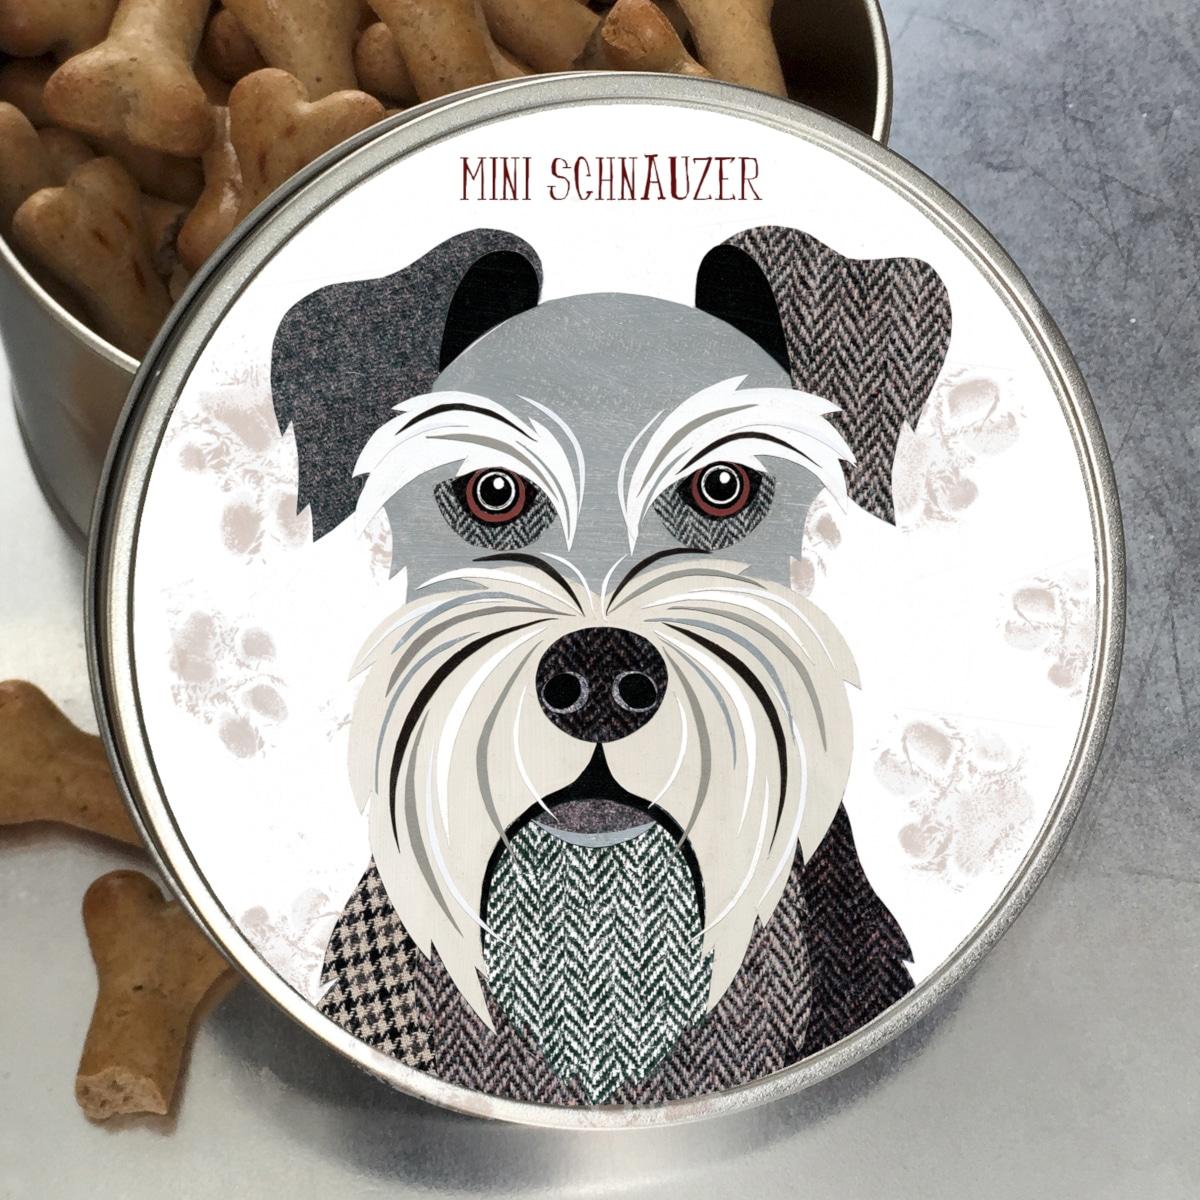 Mini Schnauzer Dog Tin from Simon Hart